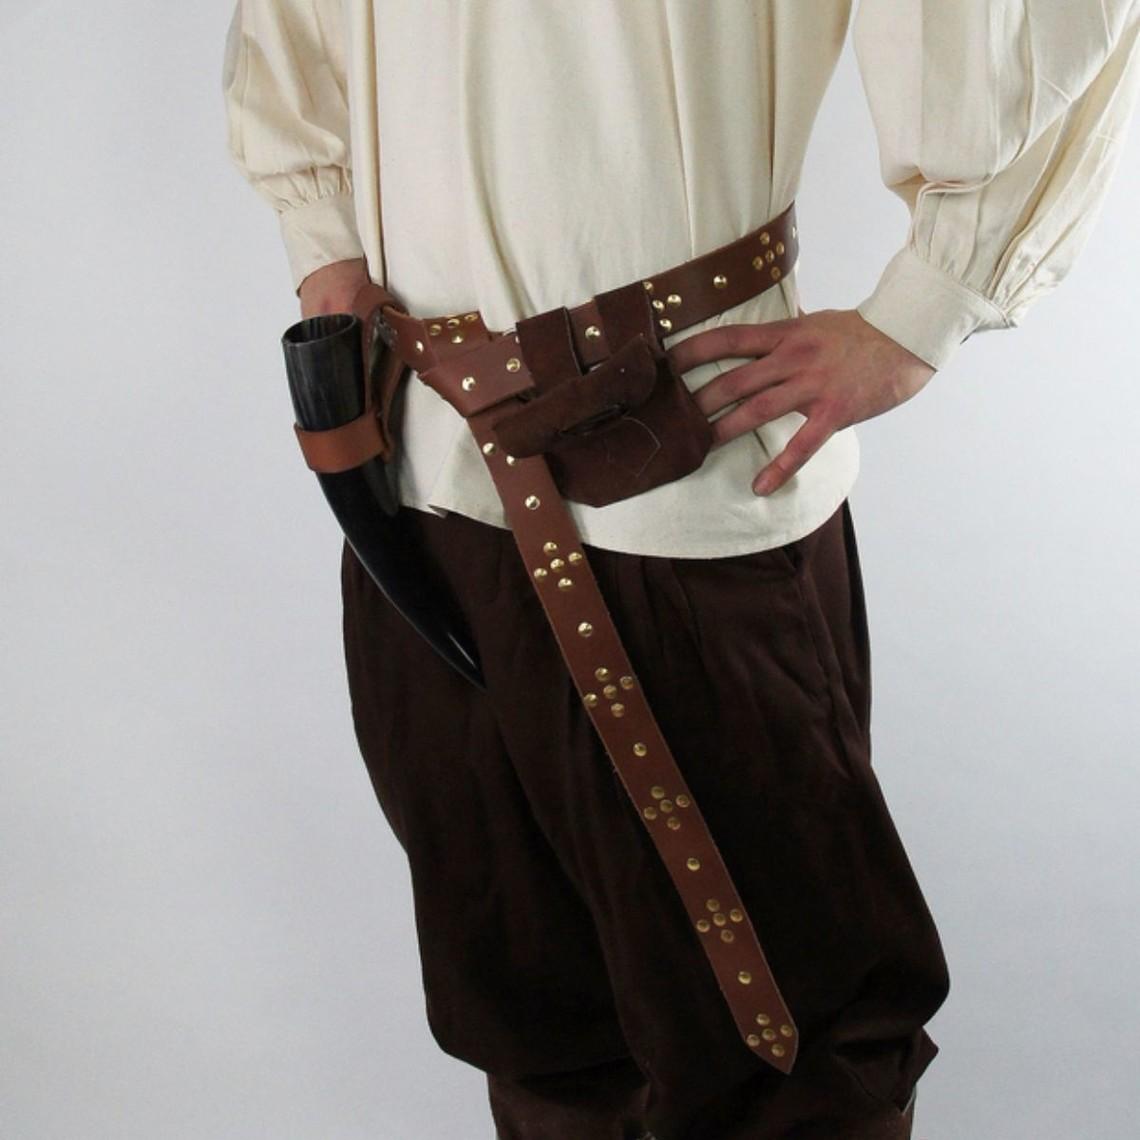 Leonardo Carbone Pantalones Faust, marrón